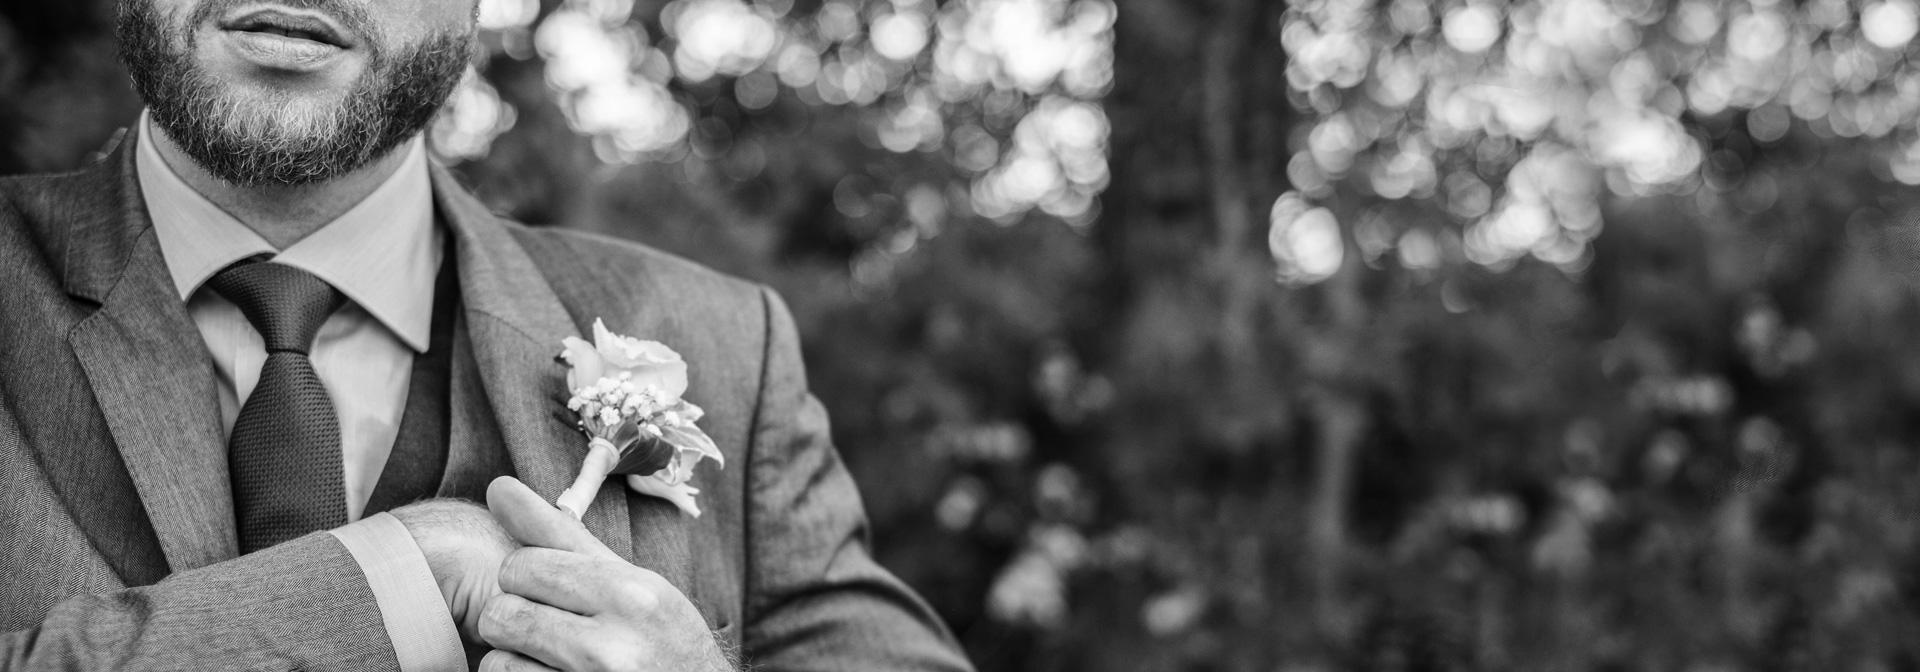 photographe mariage bruxelles